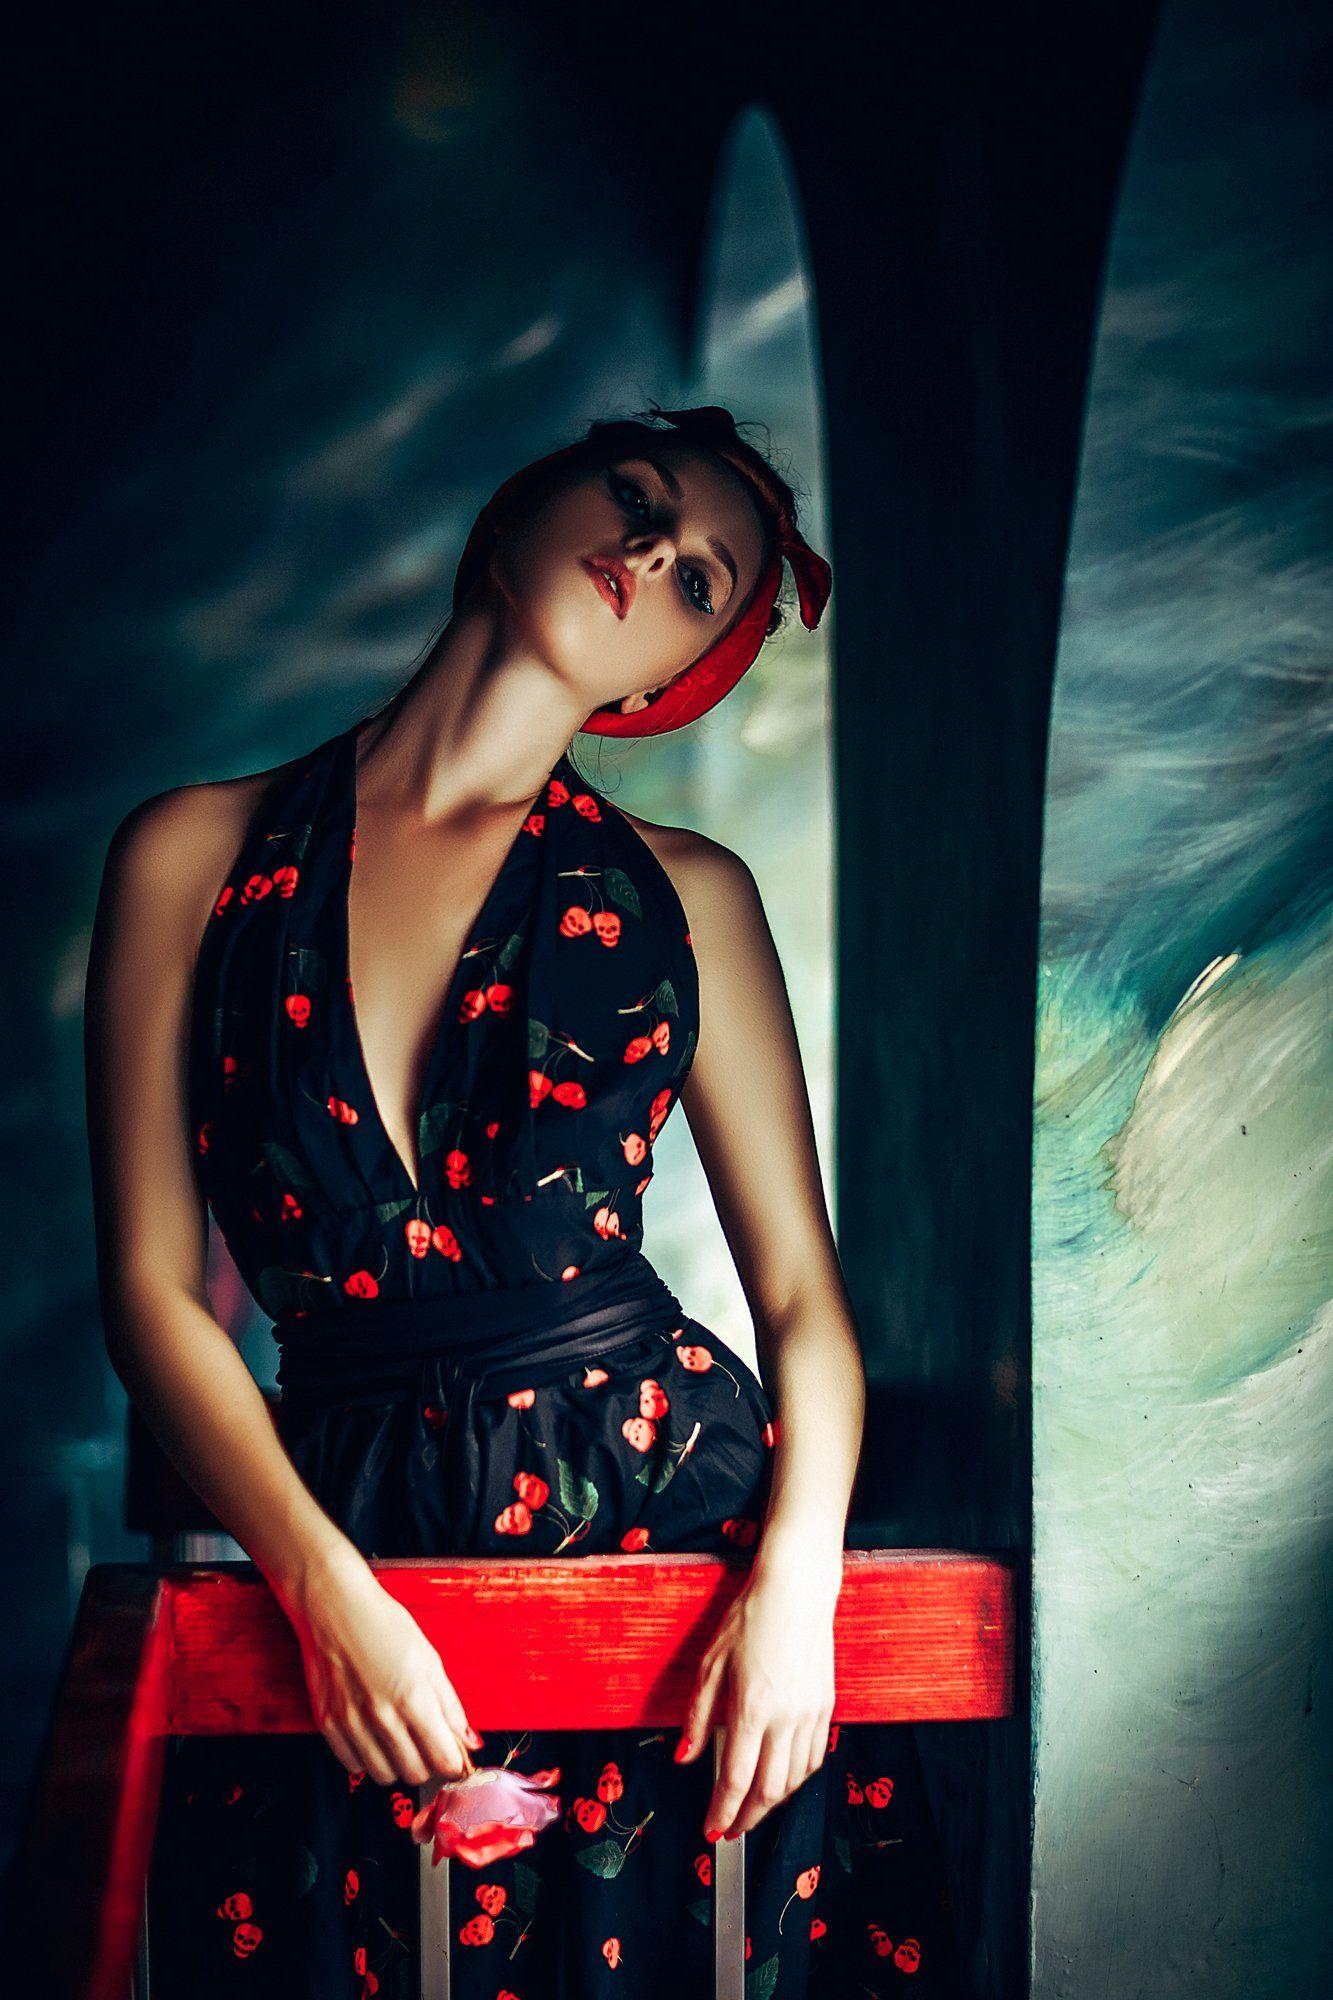 woman, art, portrait, fashion, beauty, natural light, Руслан Болгов (Axe)